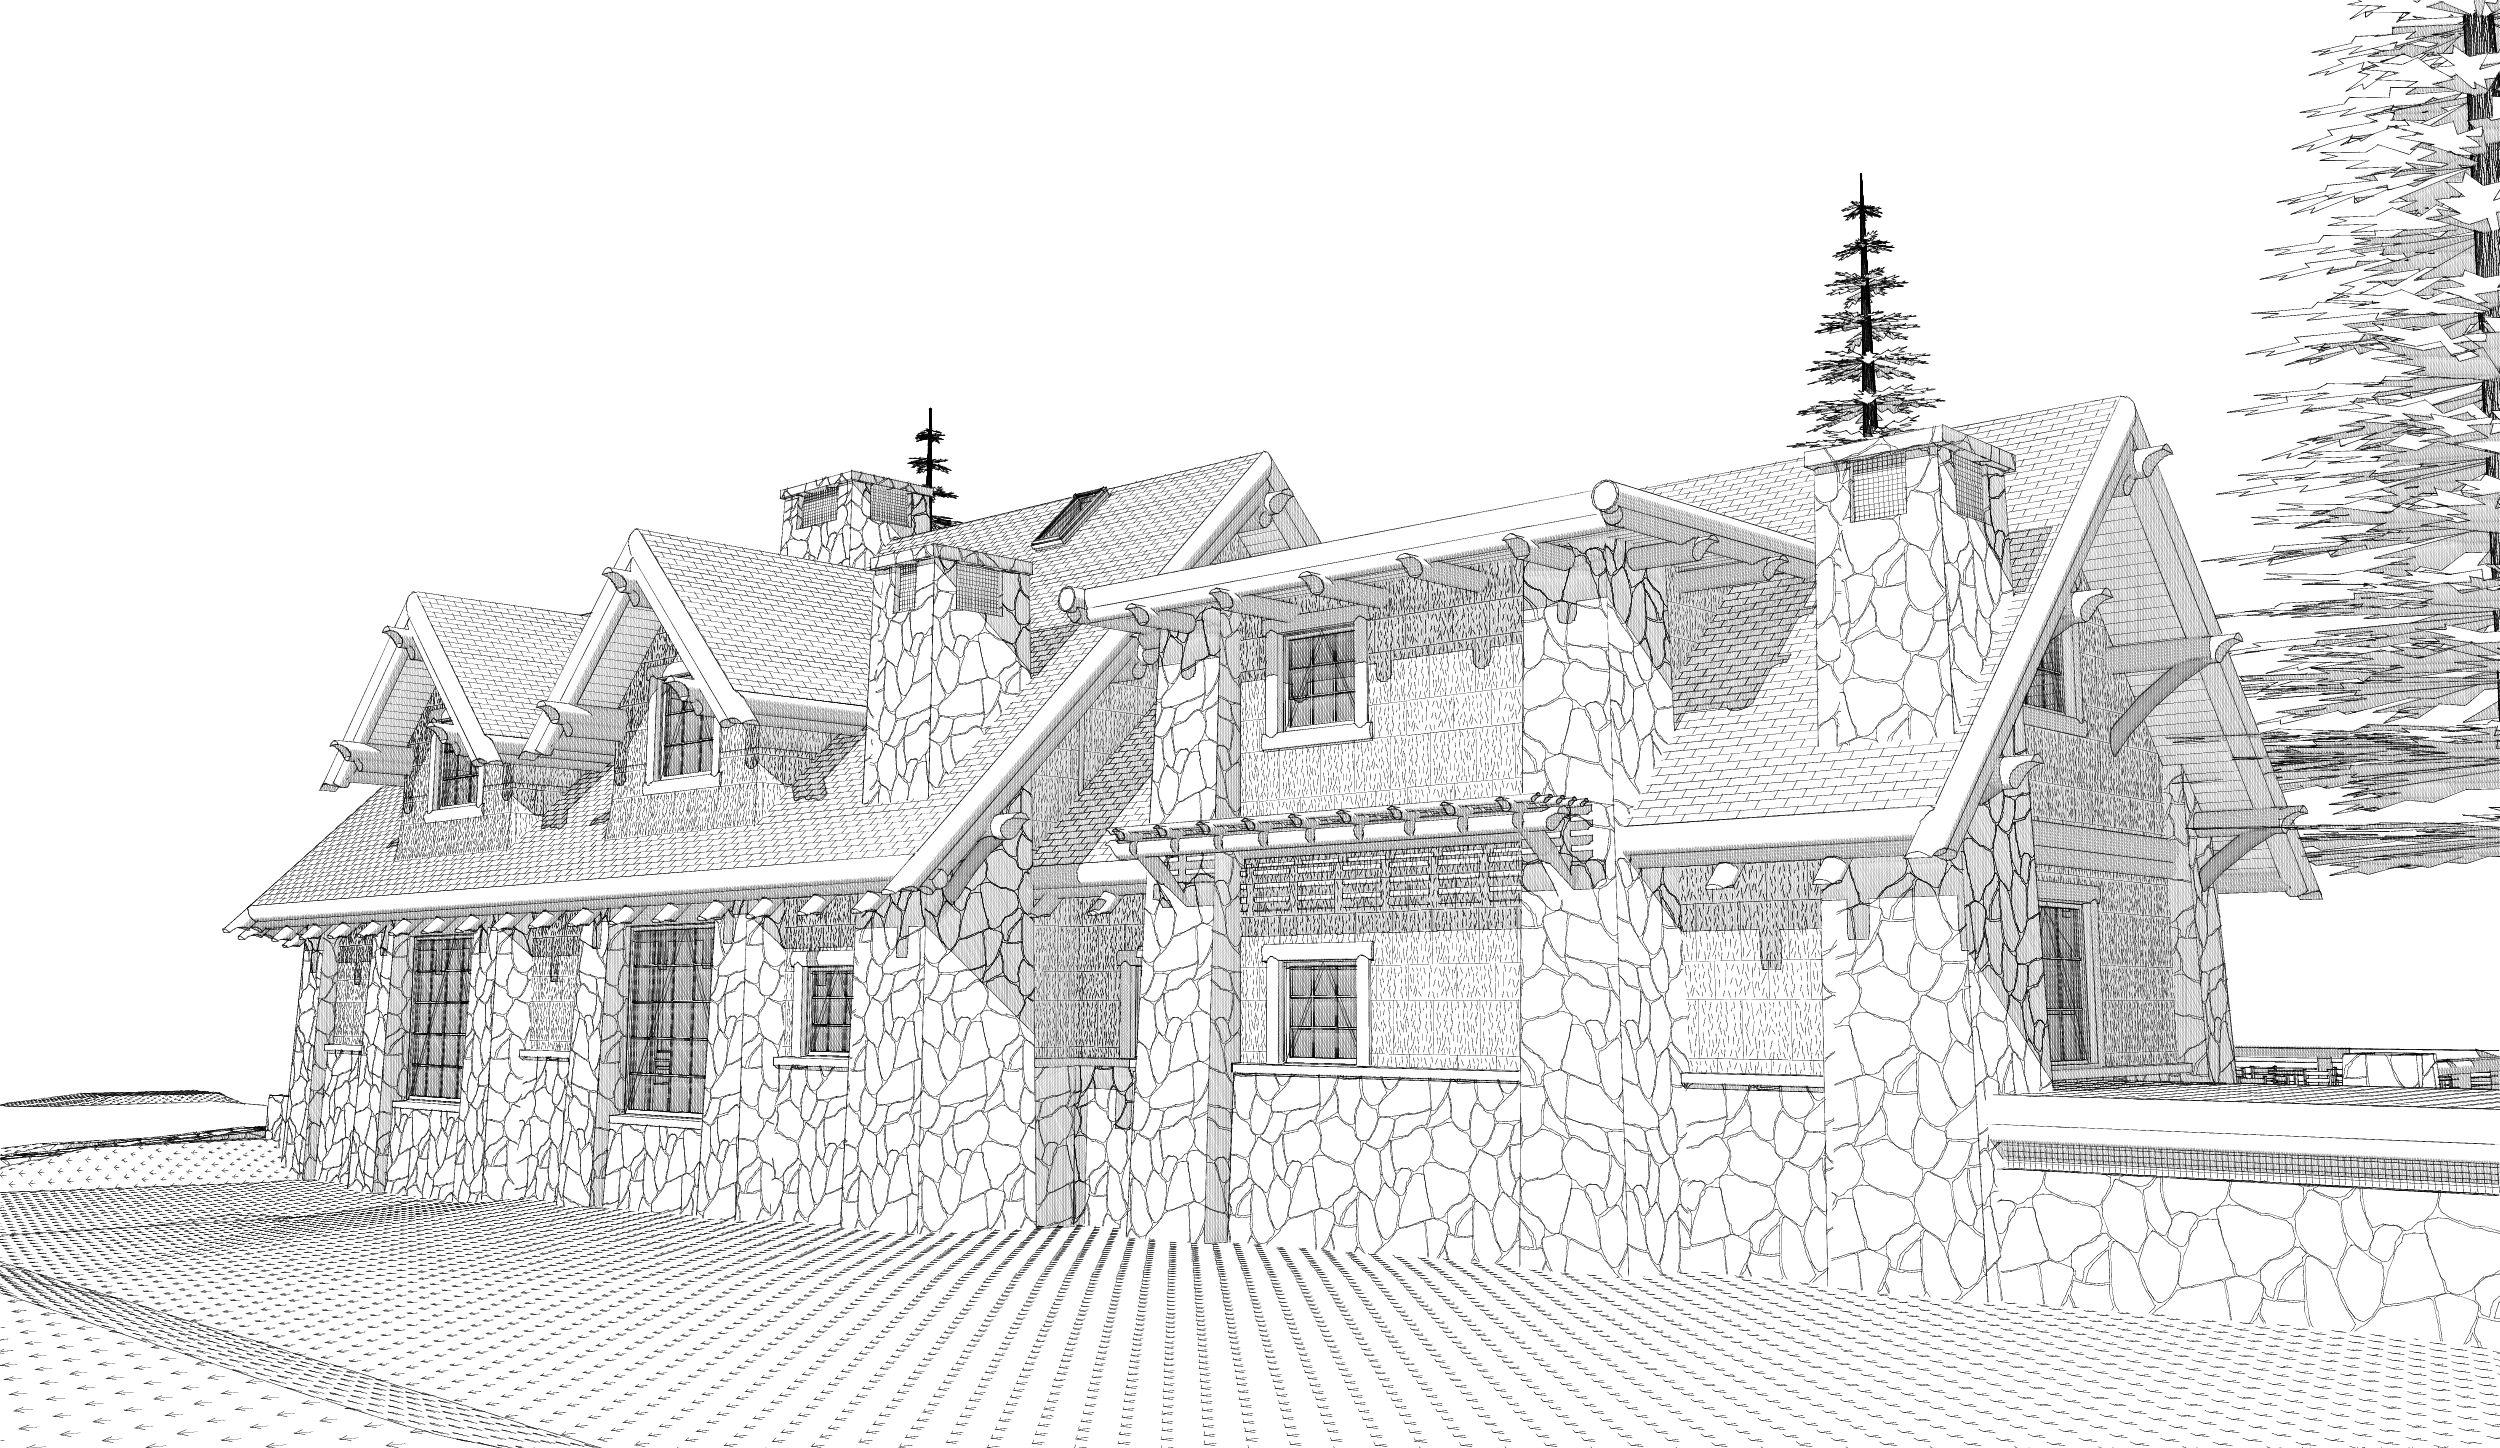 ARCHITECT RUSTIC DESIGN HOUSE NC 03.jpg